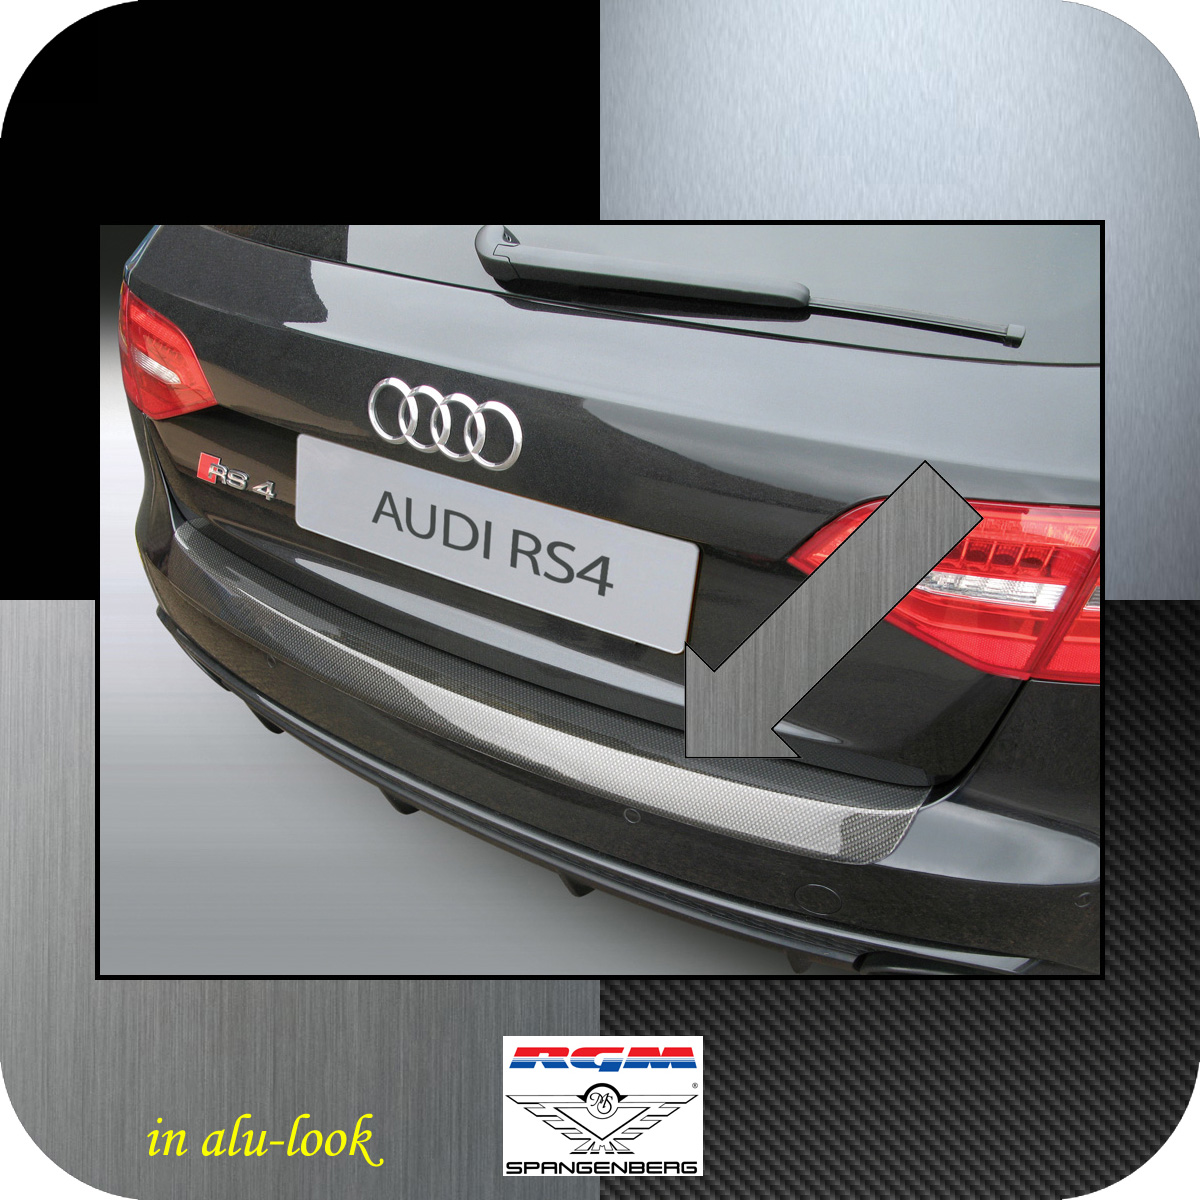 Ladekantenschutz Alu-Look Audi A4 Avant B8 nur RS4 Quattro 03.12-06.16 3504699